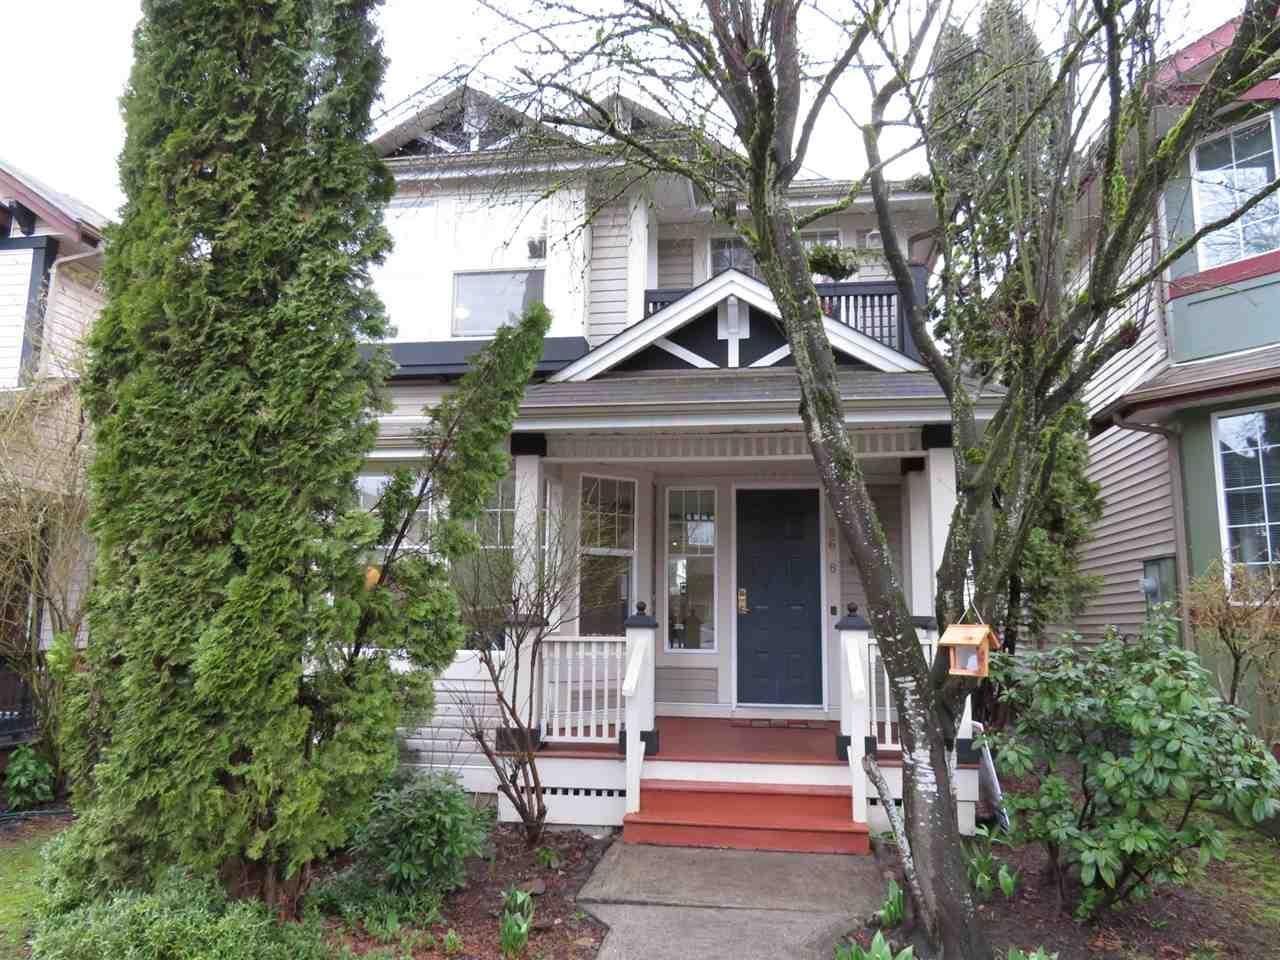 R2144956 - 8648 207 STREET, Walnut Grove, Langley, BC - House/Single Family